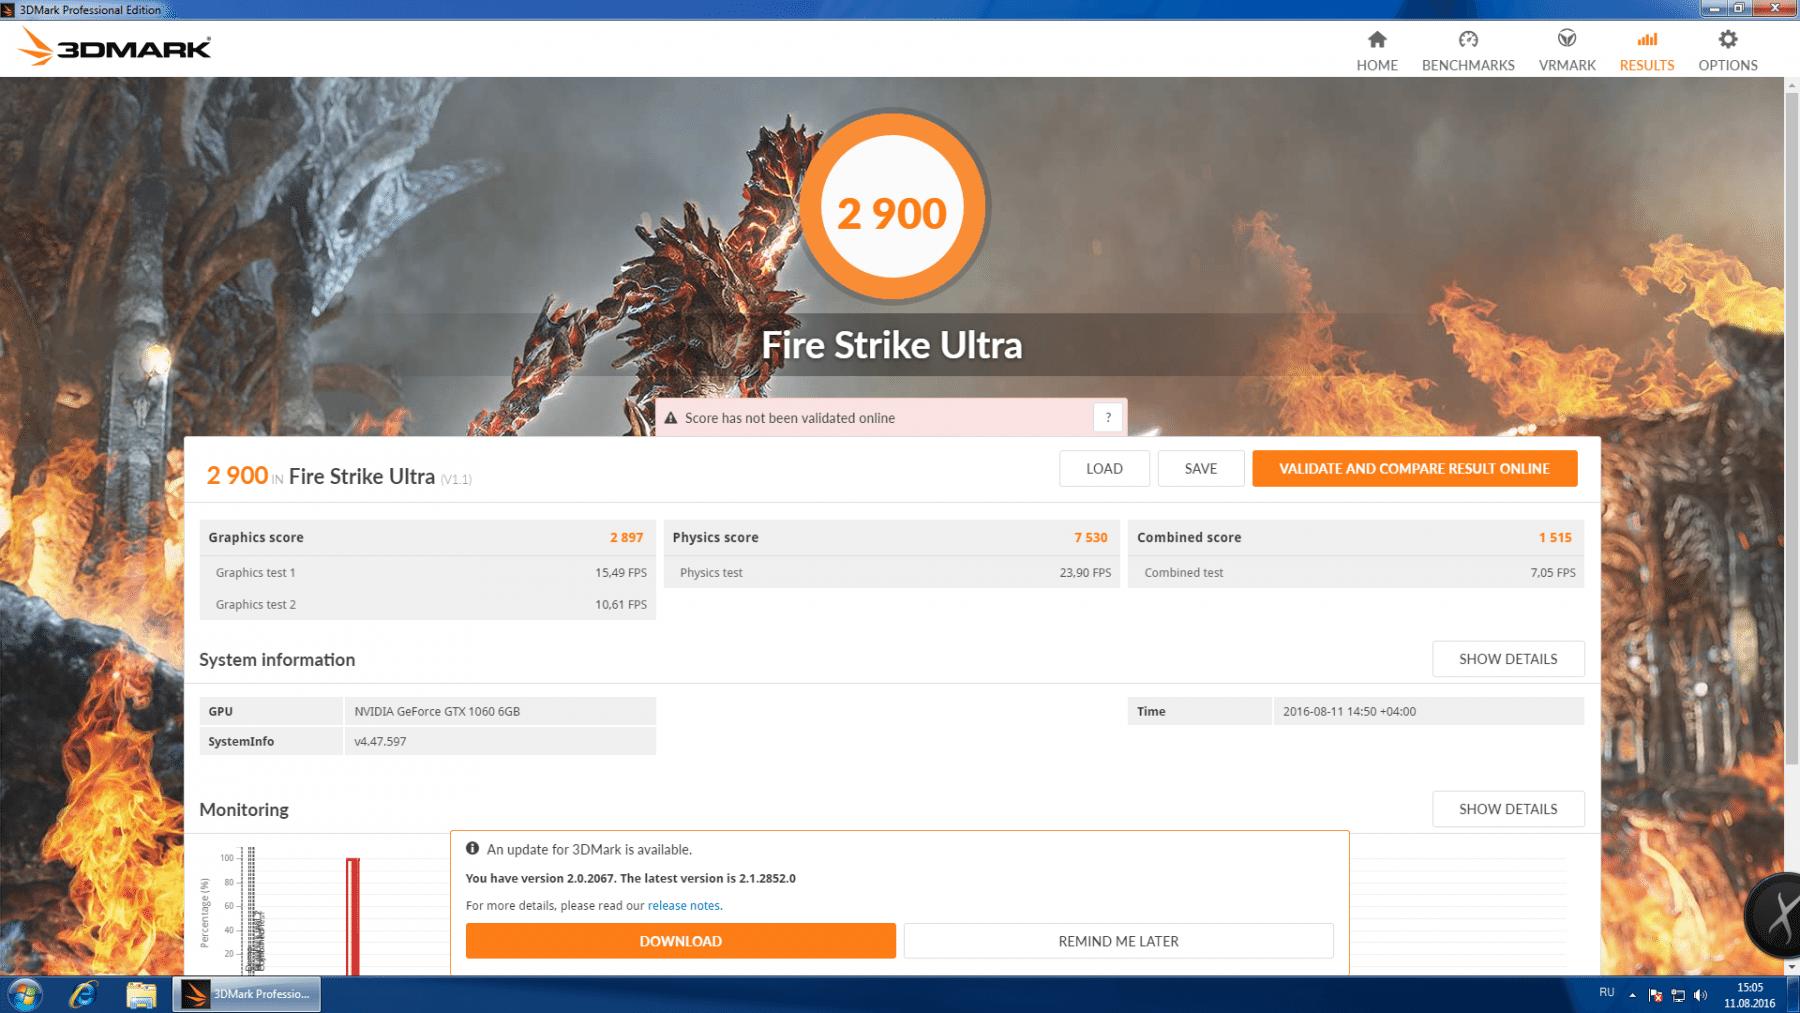 Intel Xeon E5-2609 v4 3dmark